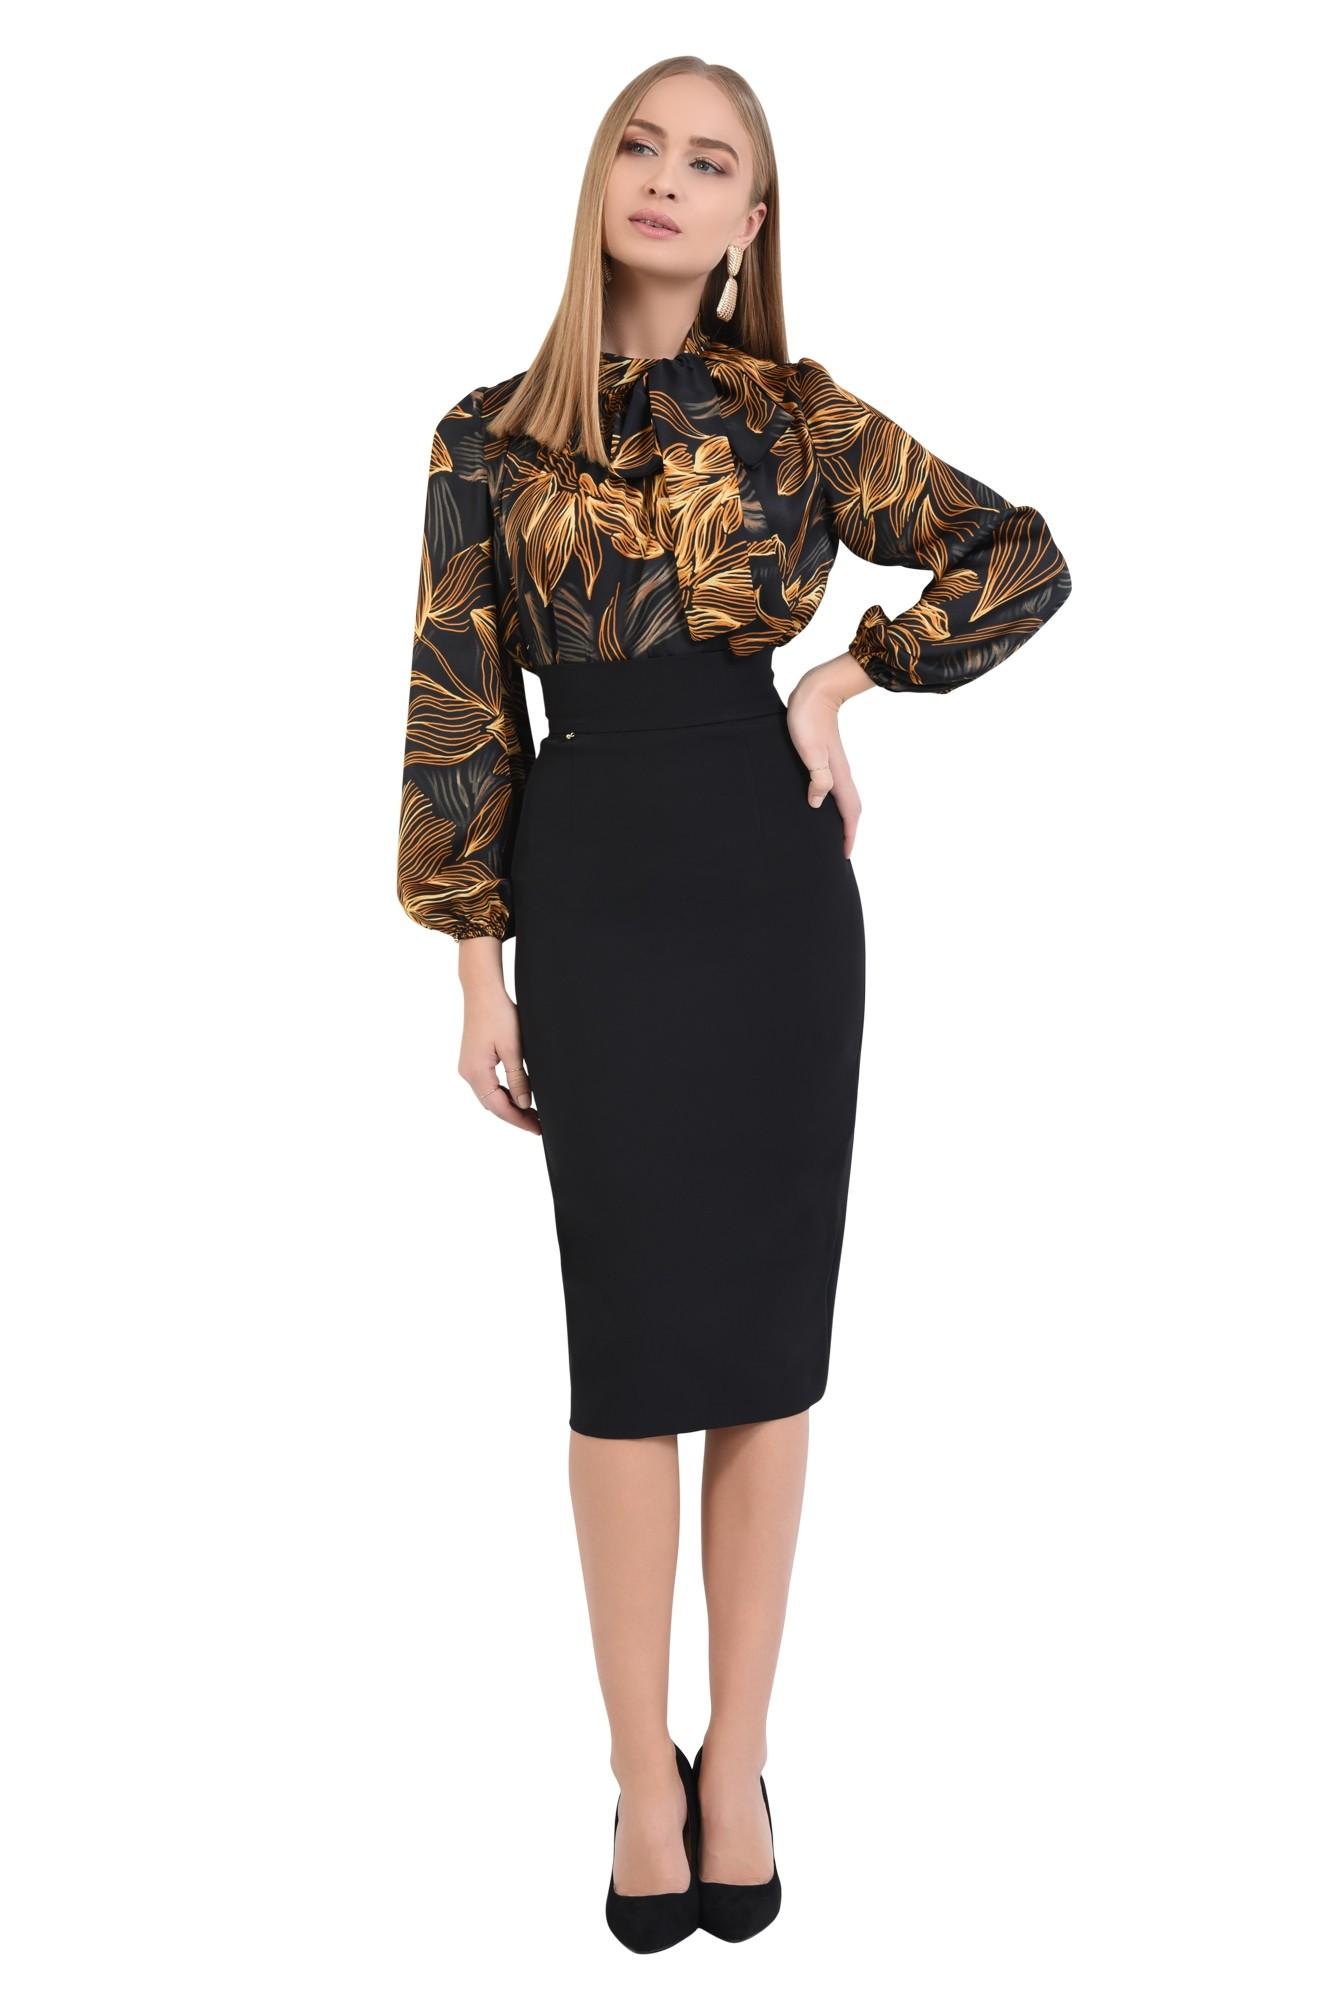 360 - bluza dama, online, croi lejer, funda tip esarfa